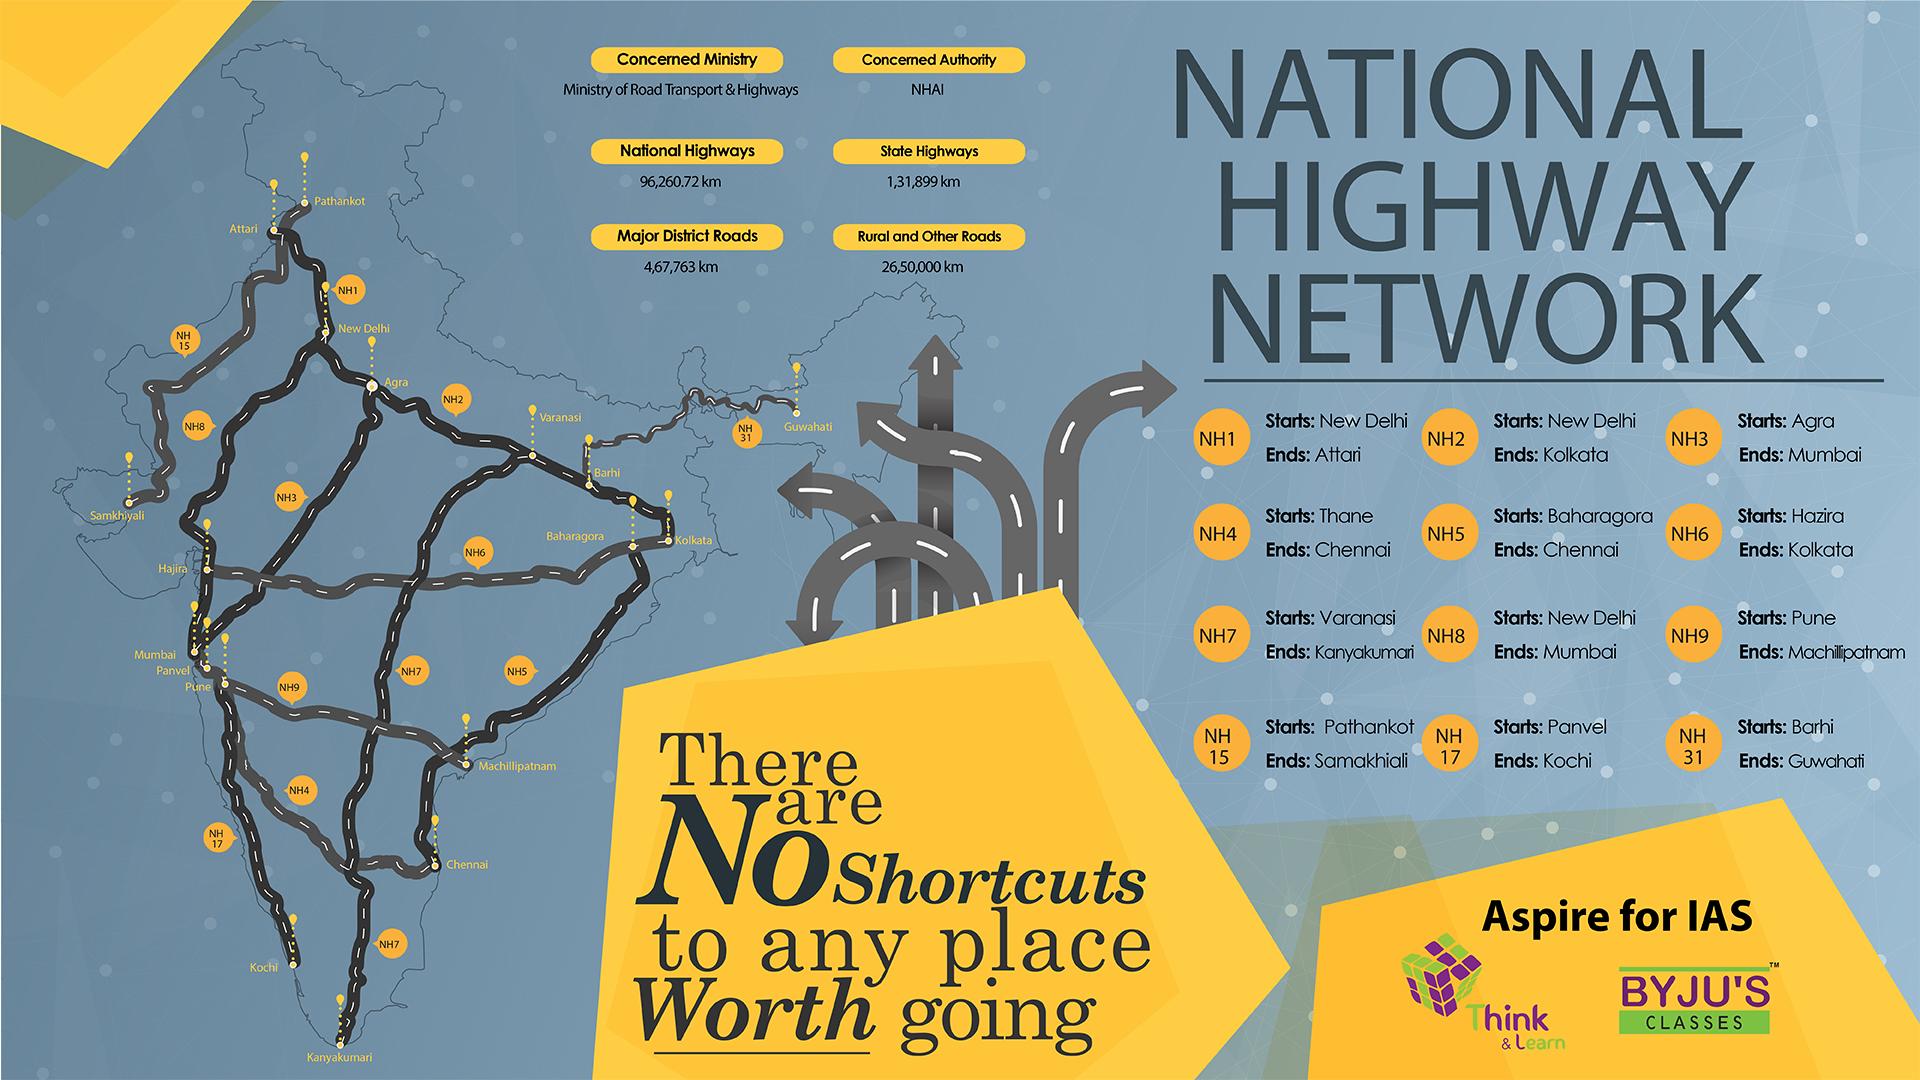 National Highways Wallpaper